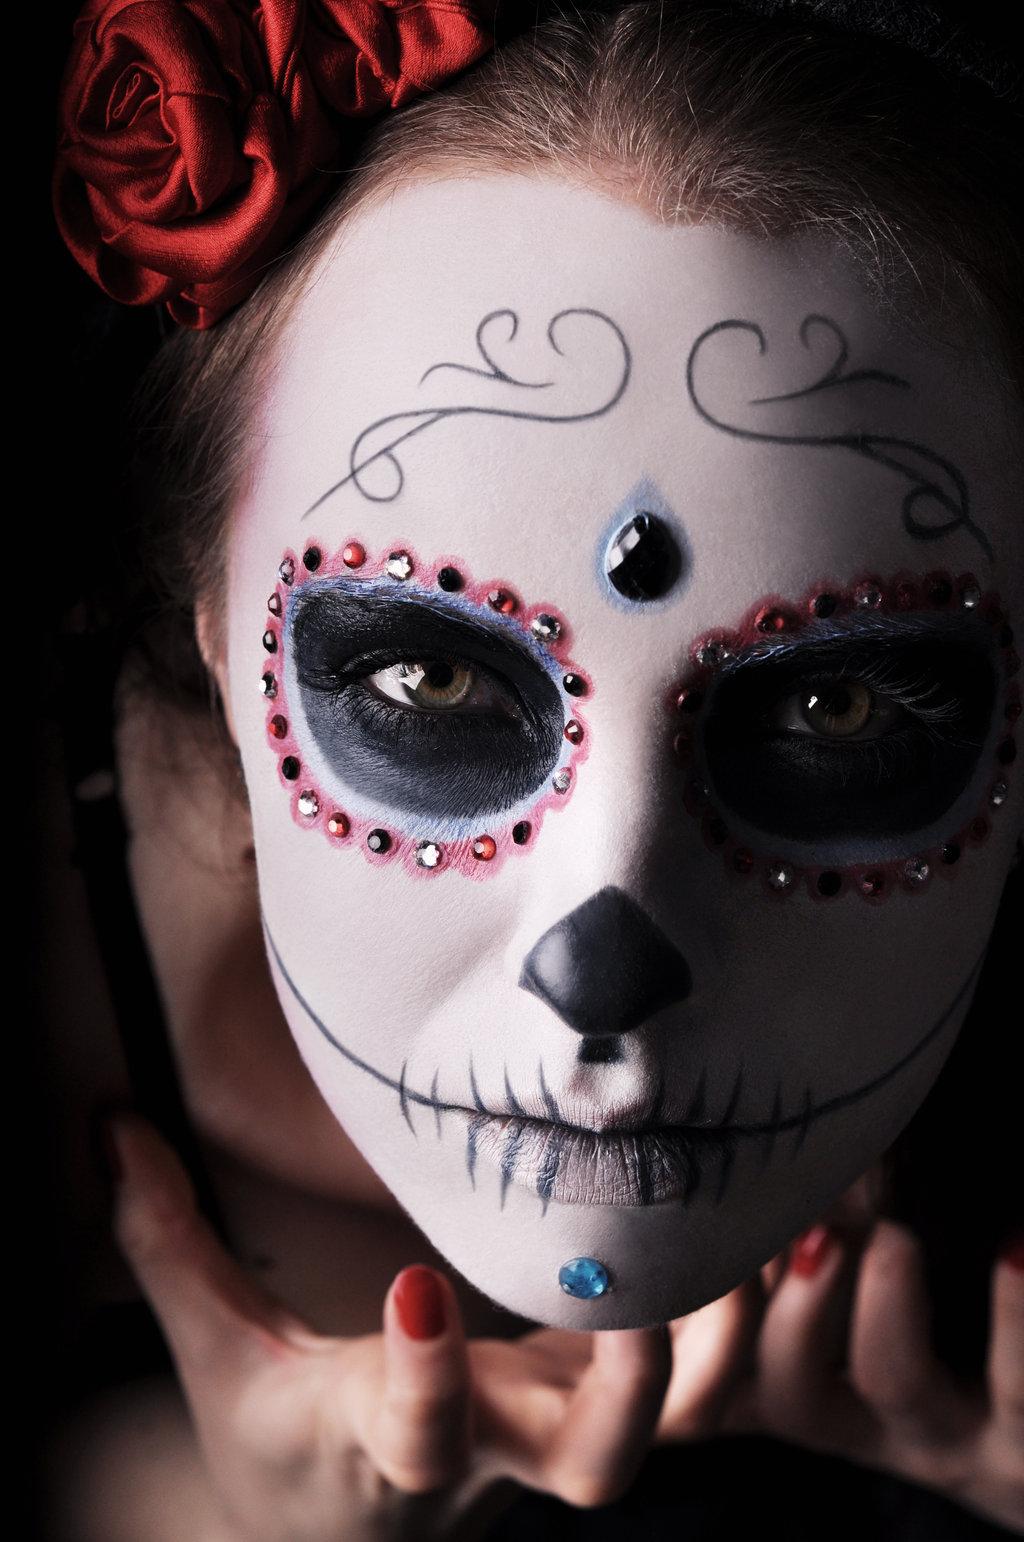 dia_de_los_muertos_2_by_b_e_t_t_y_b-d33lc00